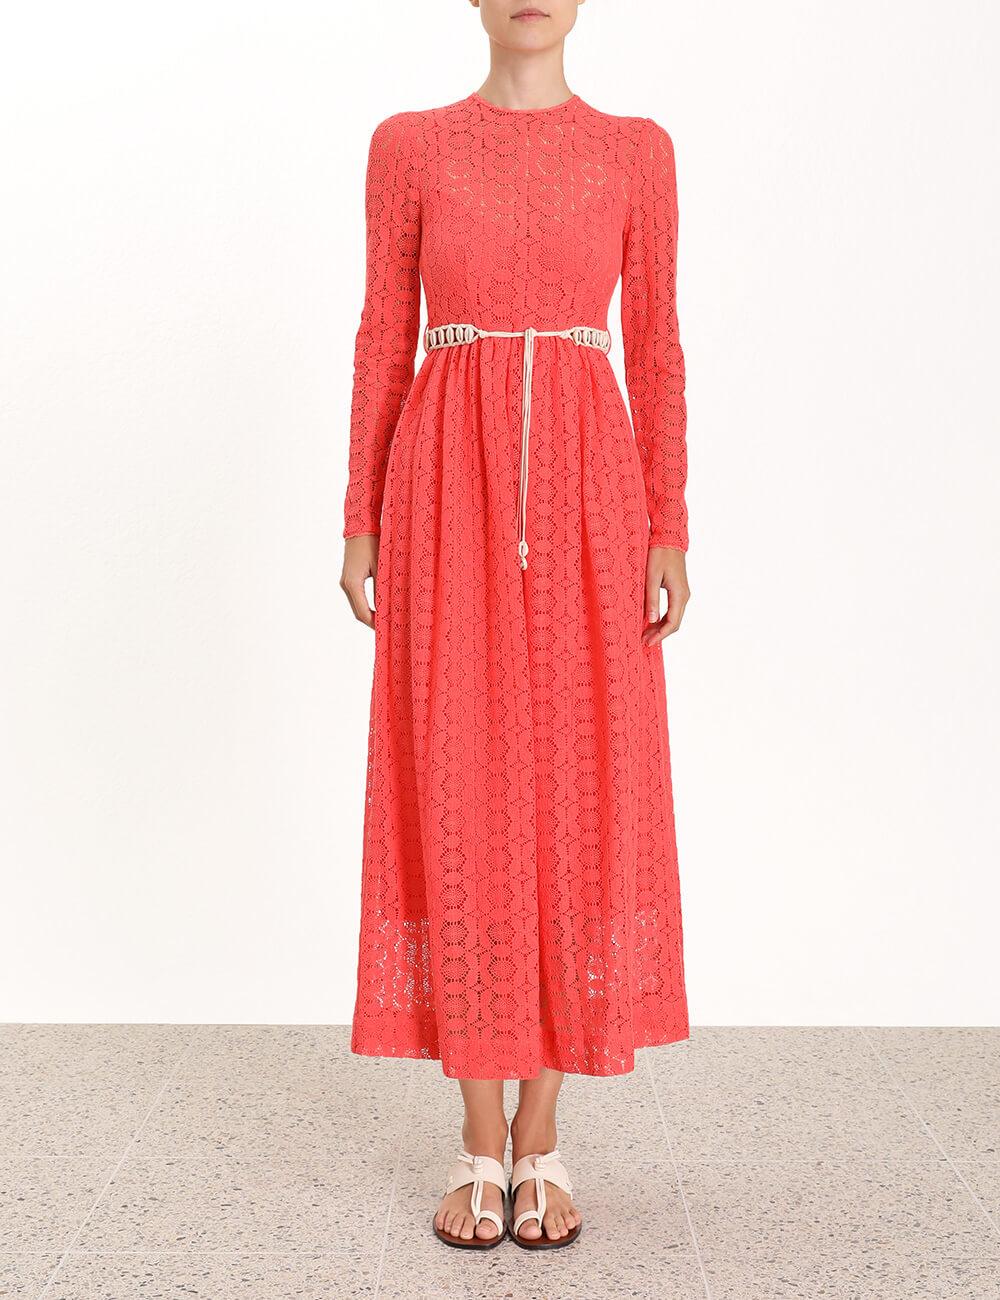 Allia High Neck Lace Dress